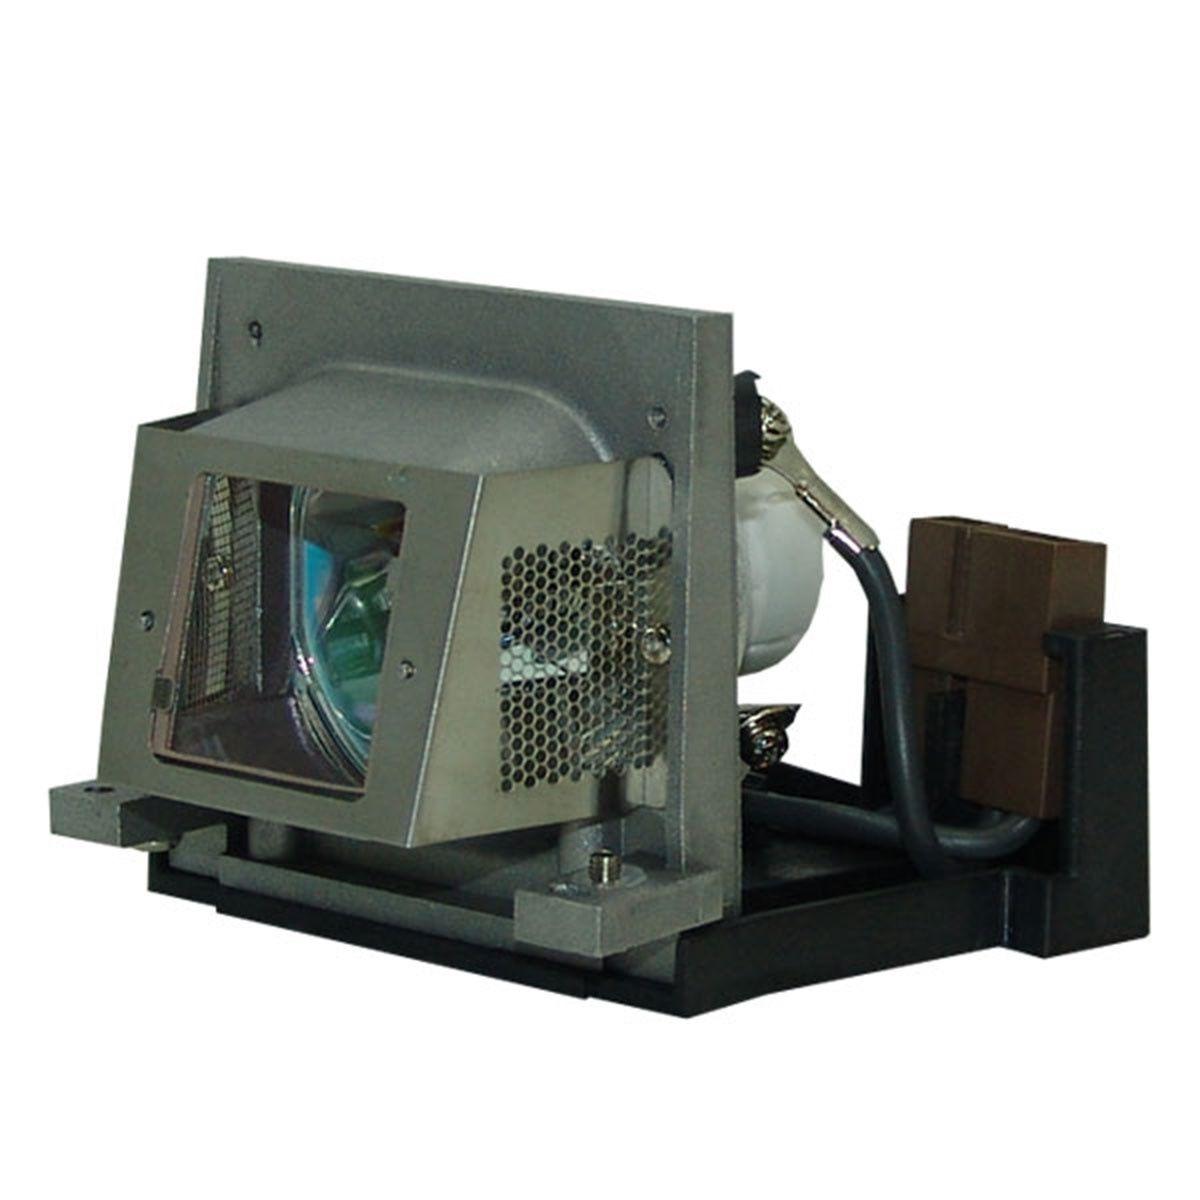 все цены на  Projector Lamp Bulb RLC-023 RLC023 for VIEWSONIC PJ558 PJ558D with housing  онлайн